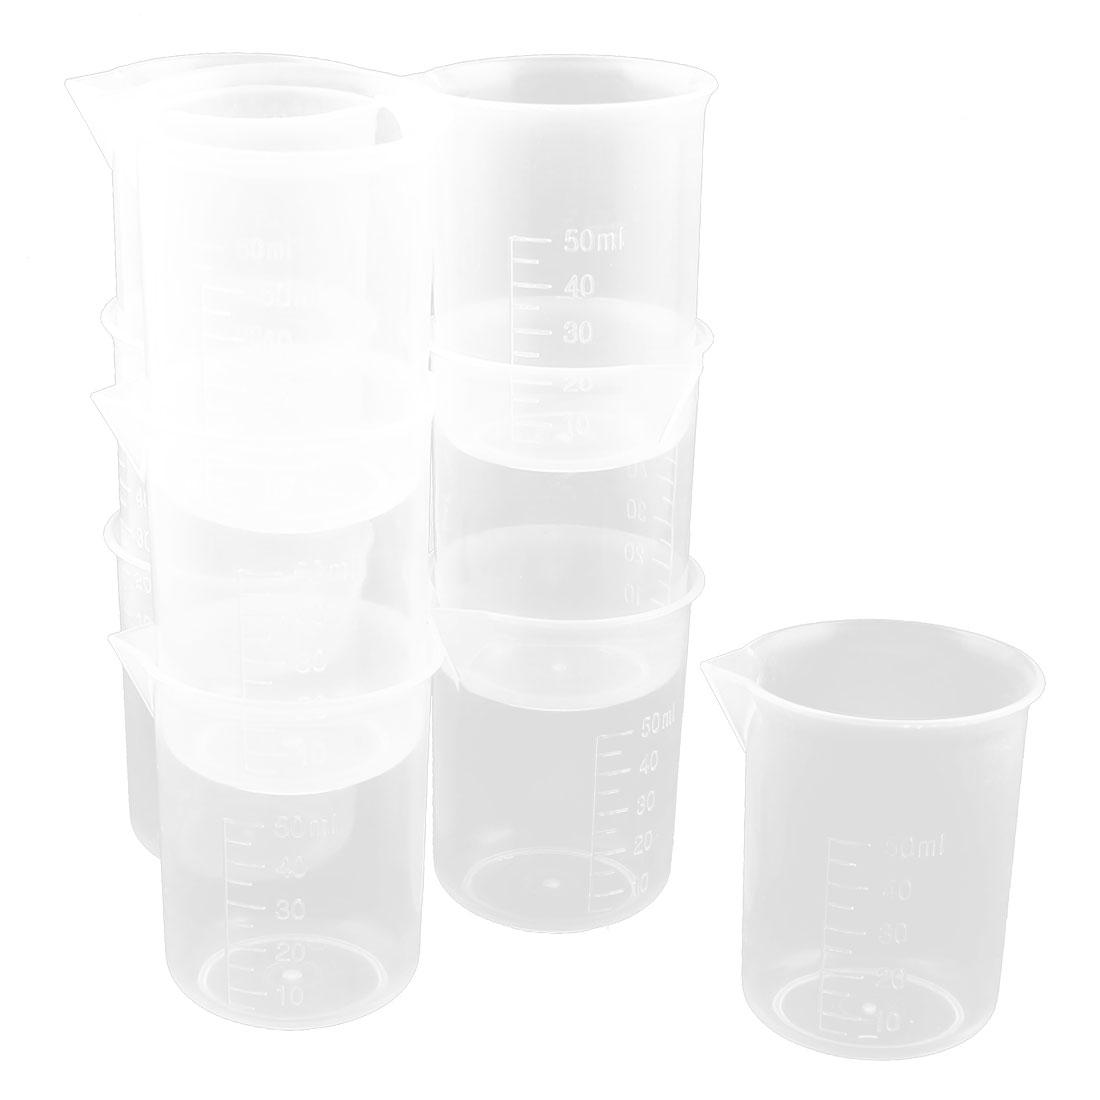 10pcs 50mL Clear Plastic Liquid Graduated Measuring Cups Holder Container